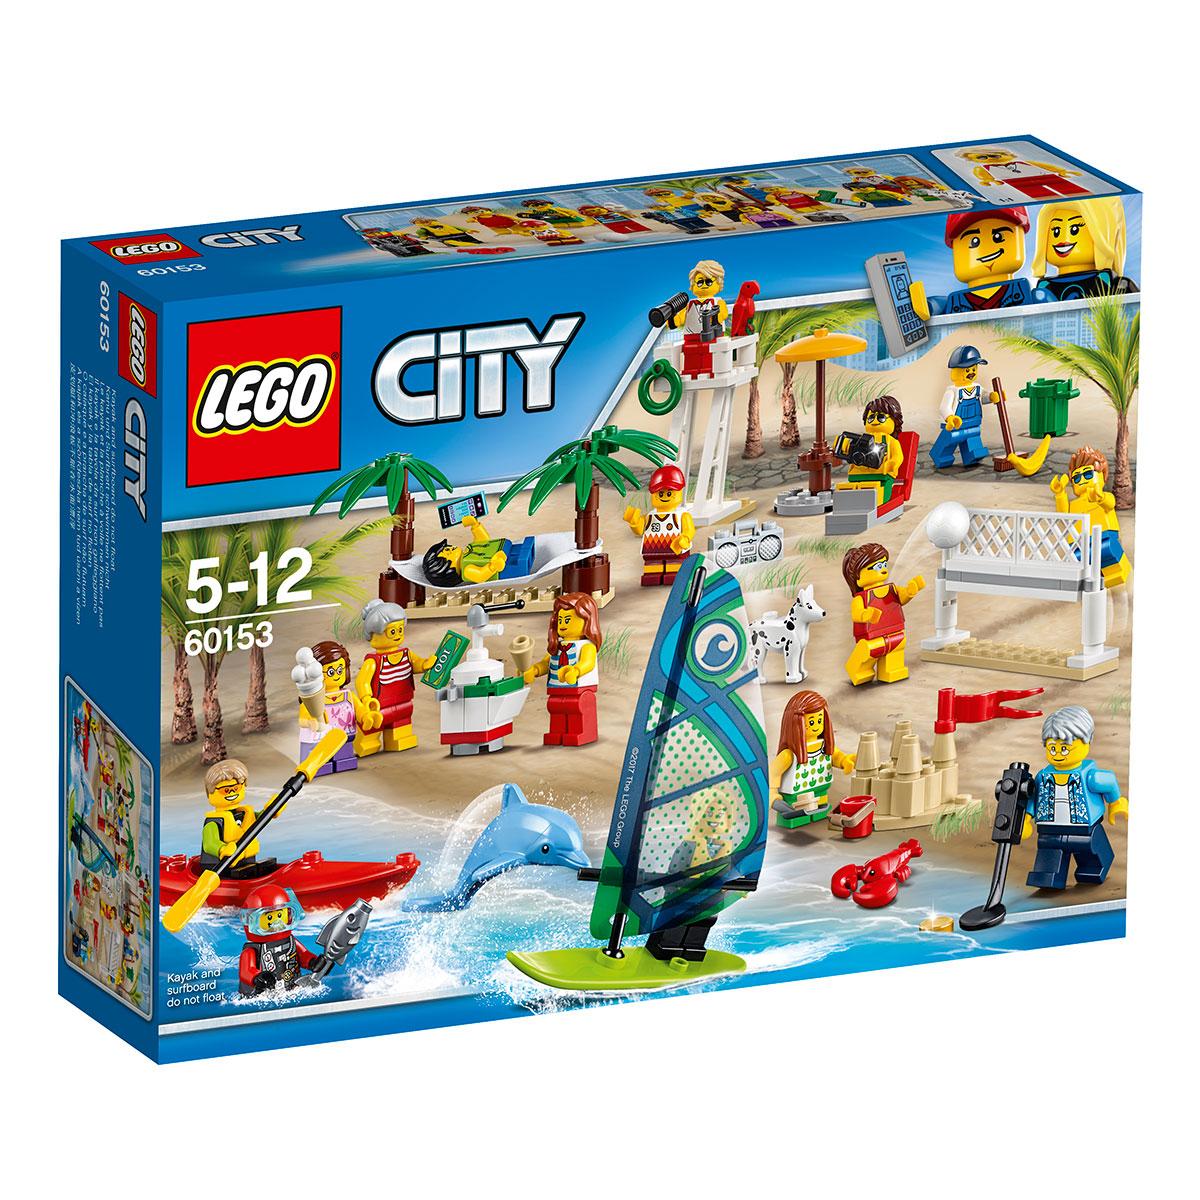 LEGO City Figursæt sjov ved stranden